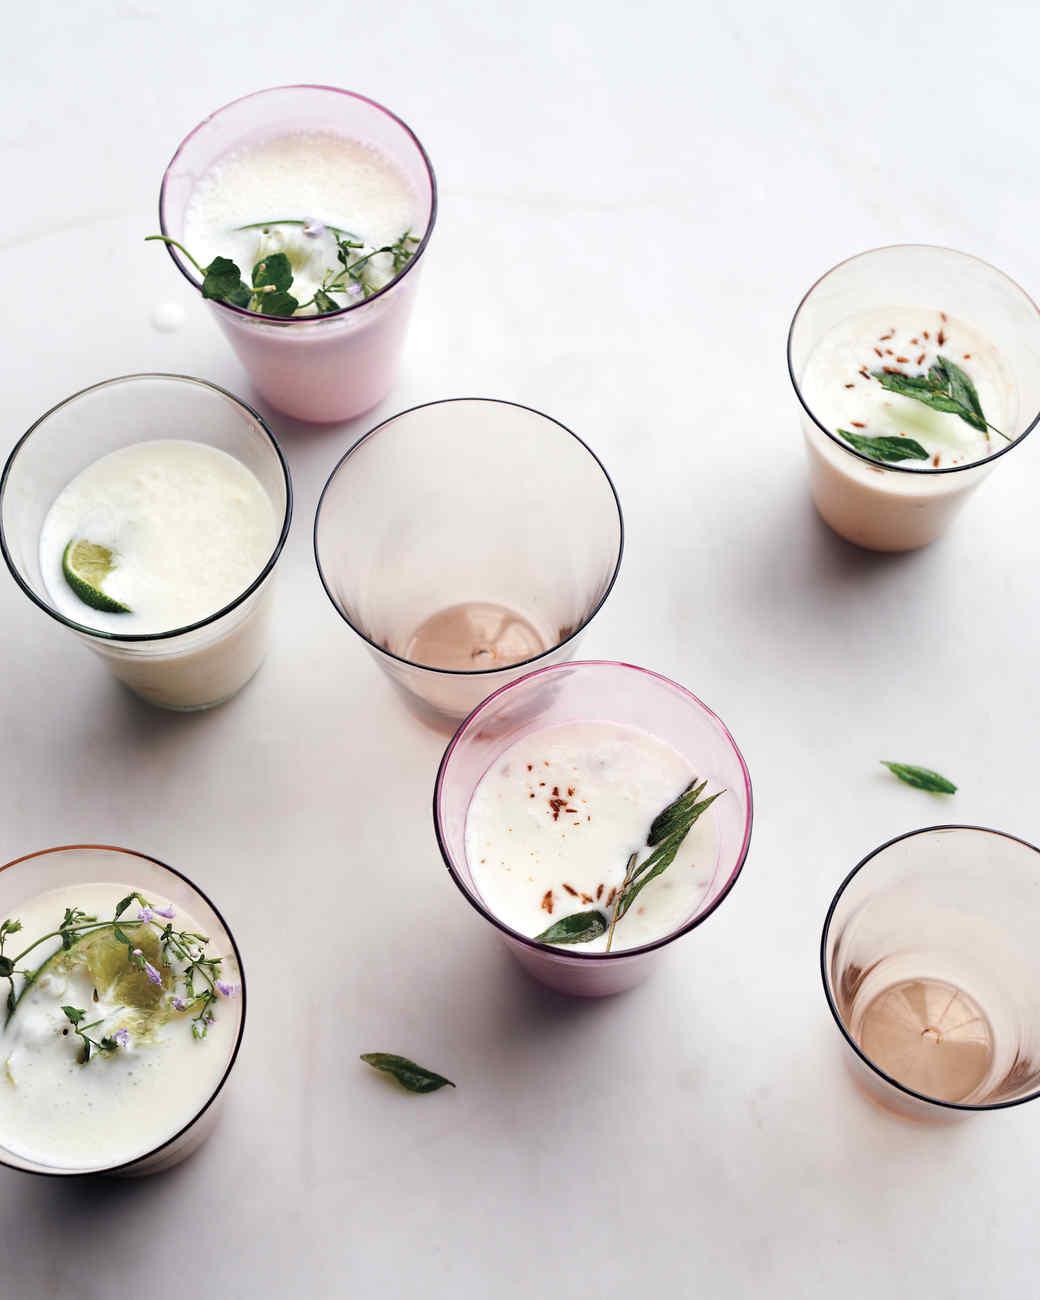 chaas-yogurt-drink-029-mld110043.jpg